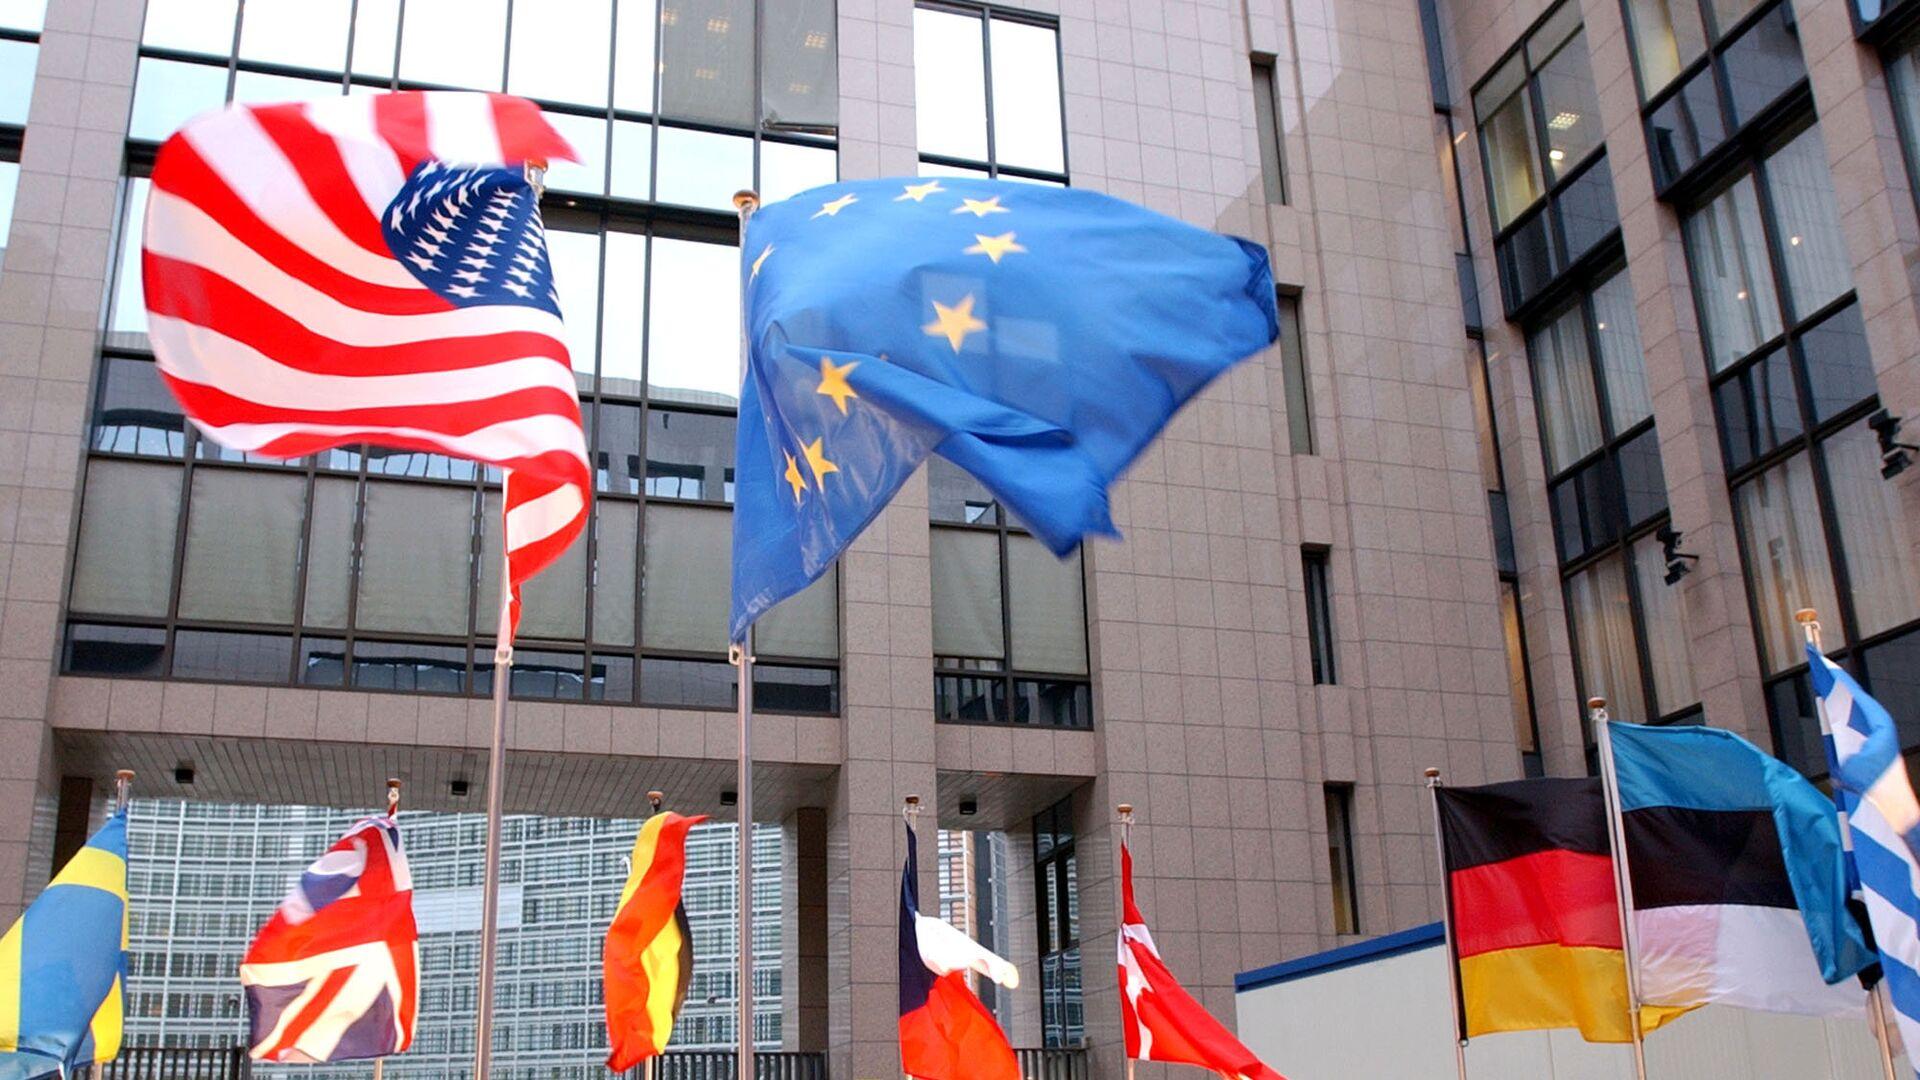 Флаги ЕС и США на здании Европейского парламента в Брюсселе  - РИА Новости, 1920, 17.09.2020